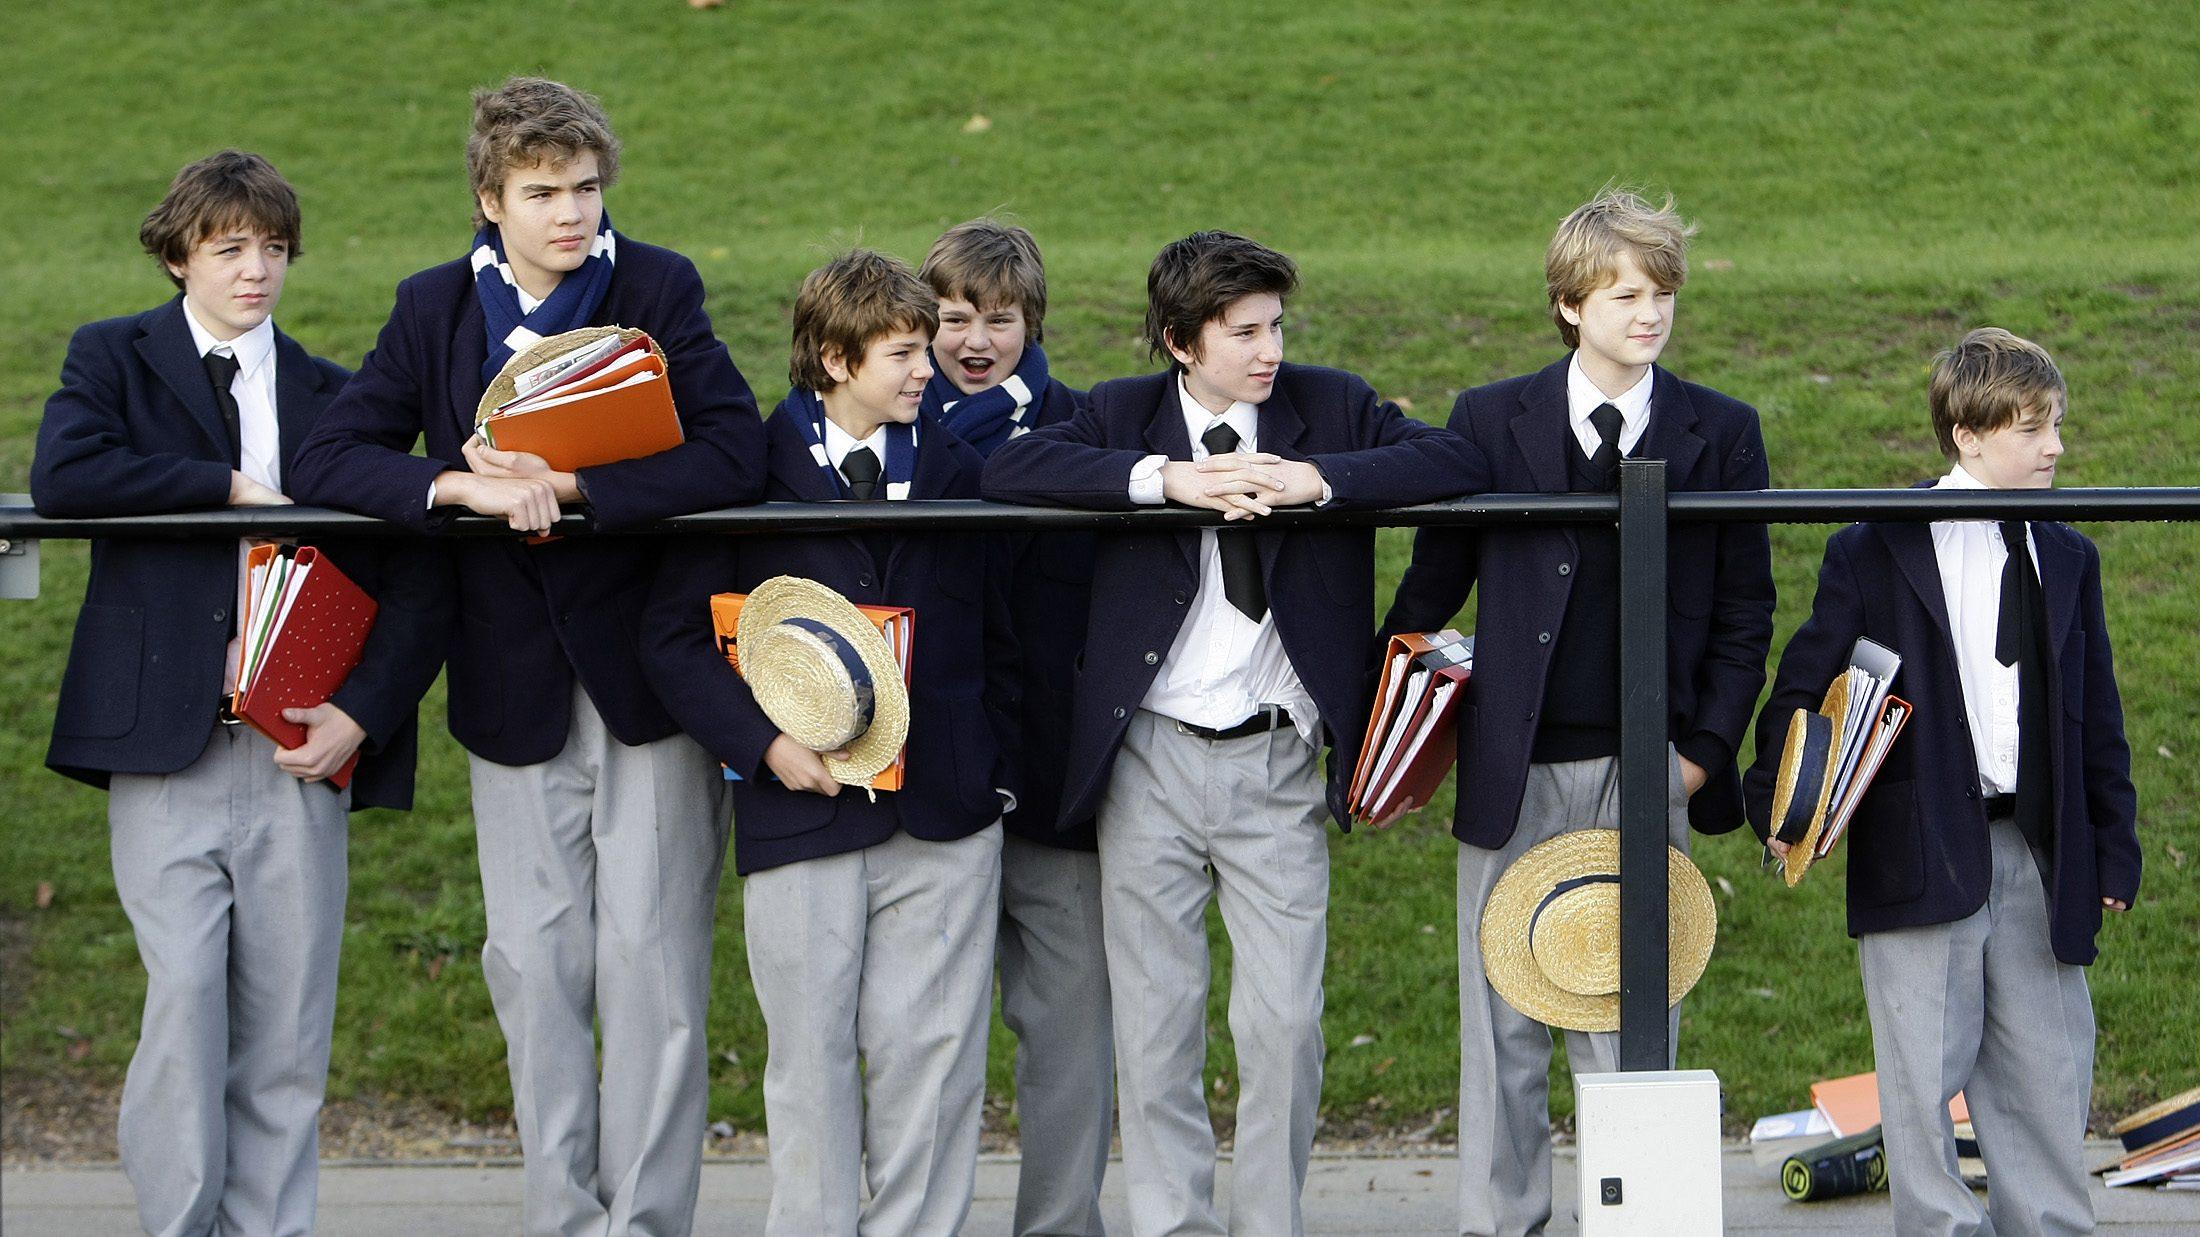 School boys of Harrow School